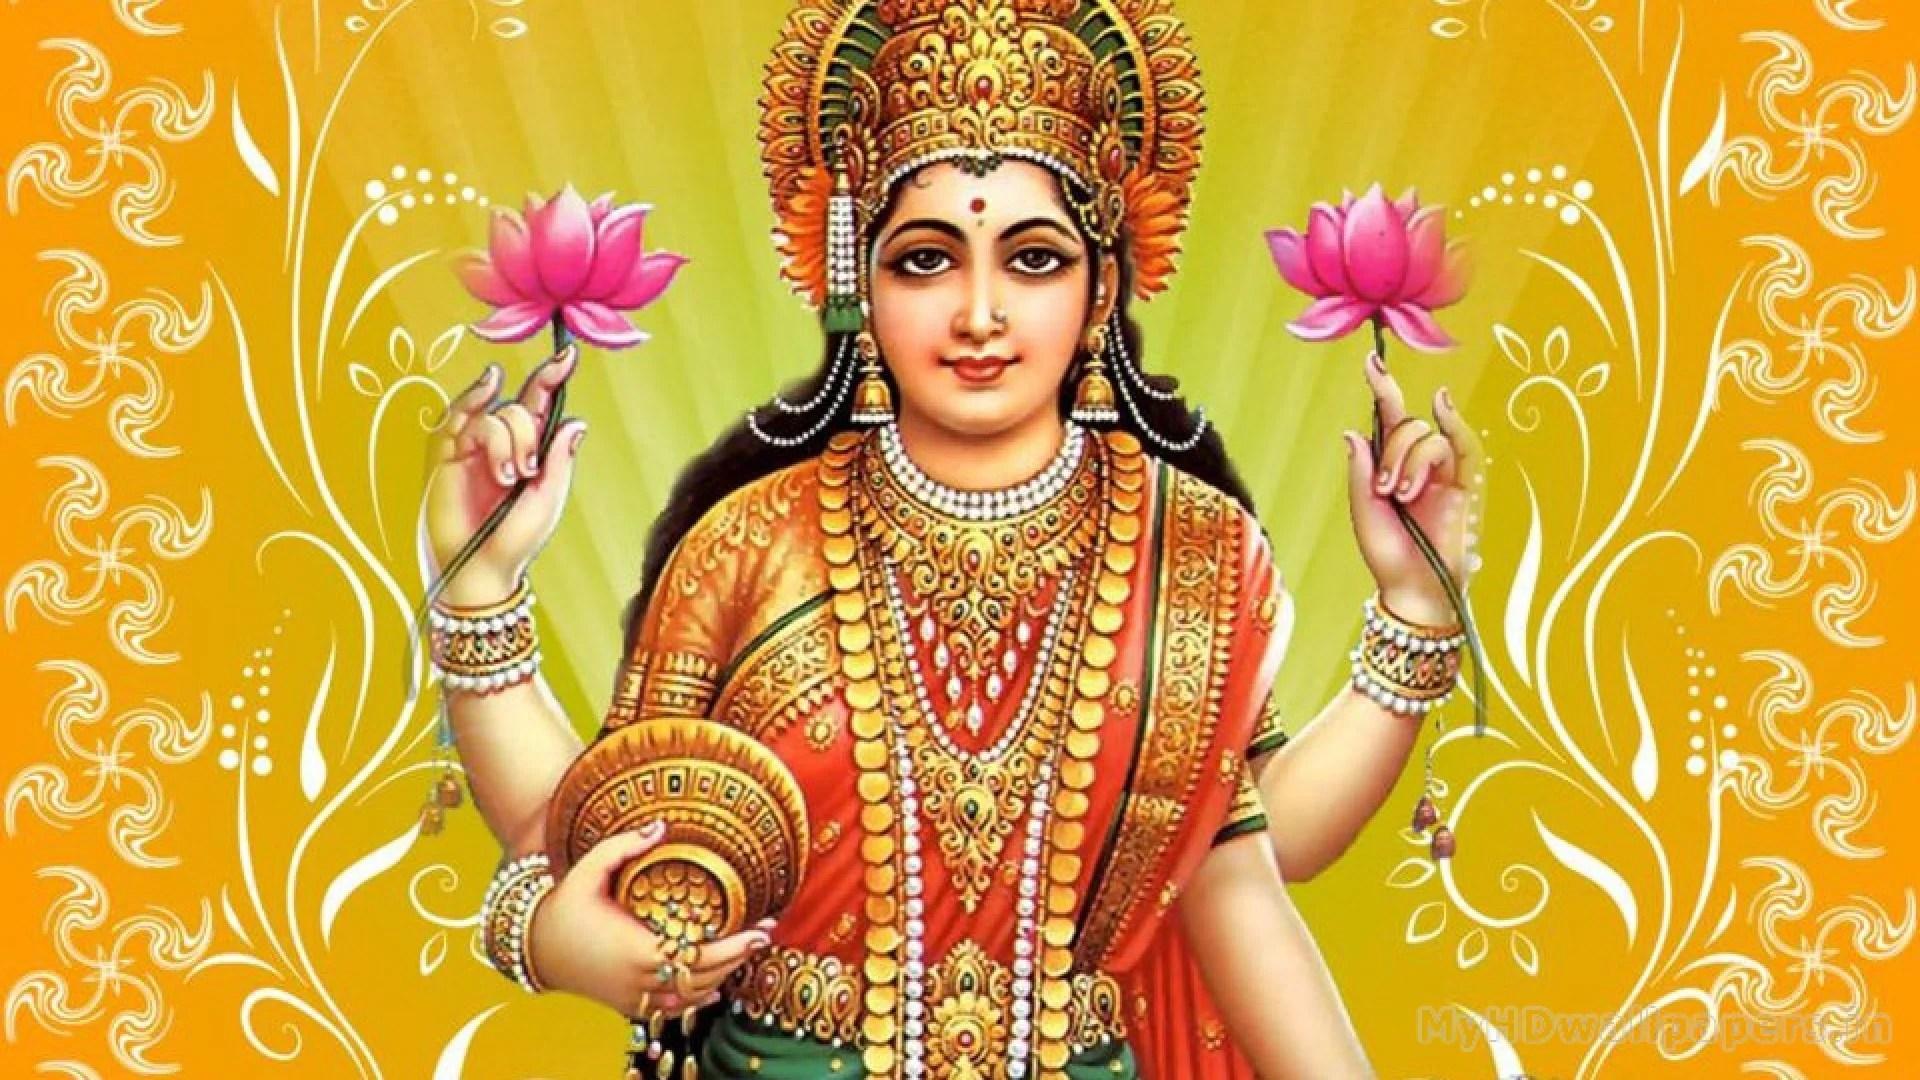 39 Hd Hindu God Desktop